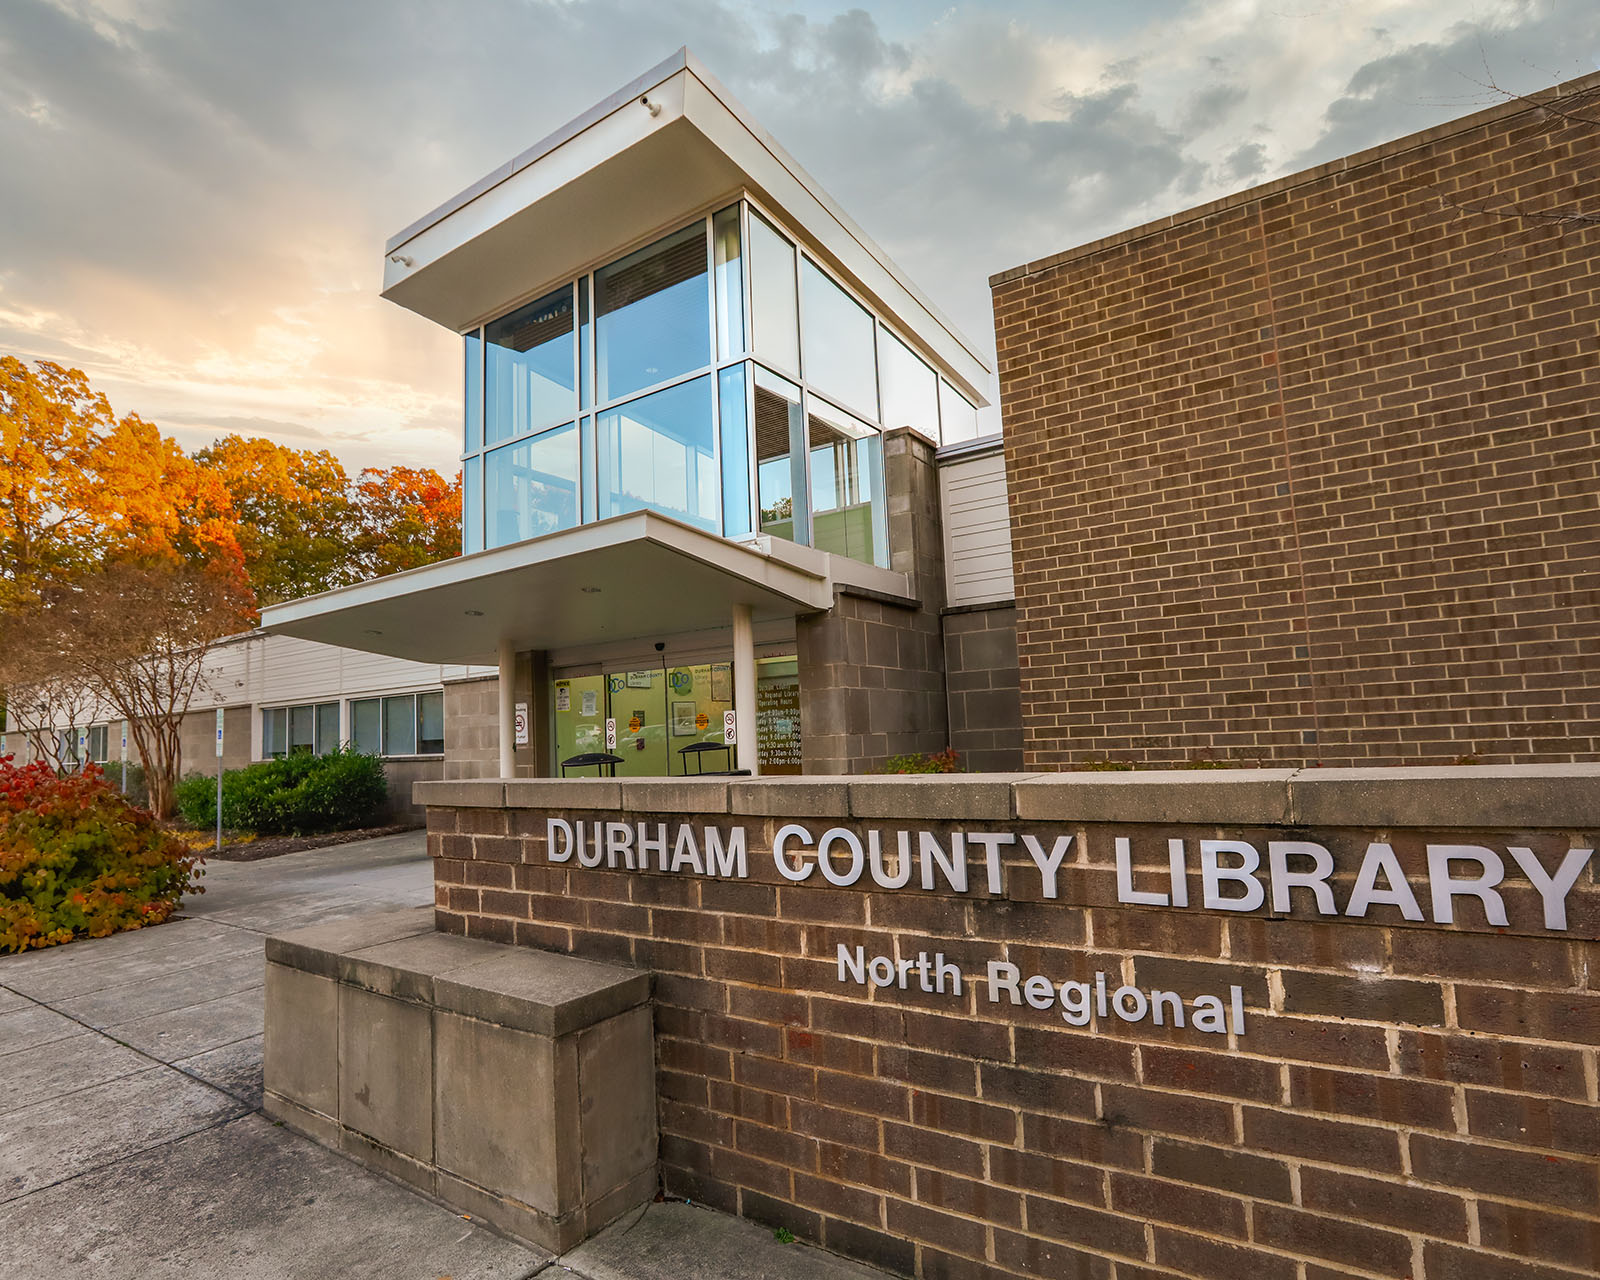 North Regional Library